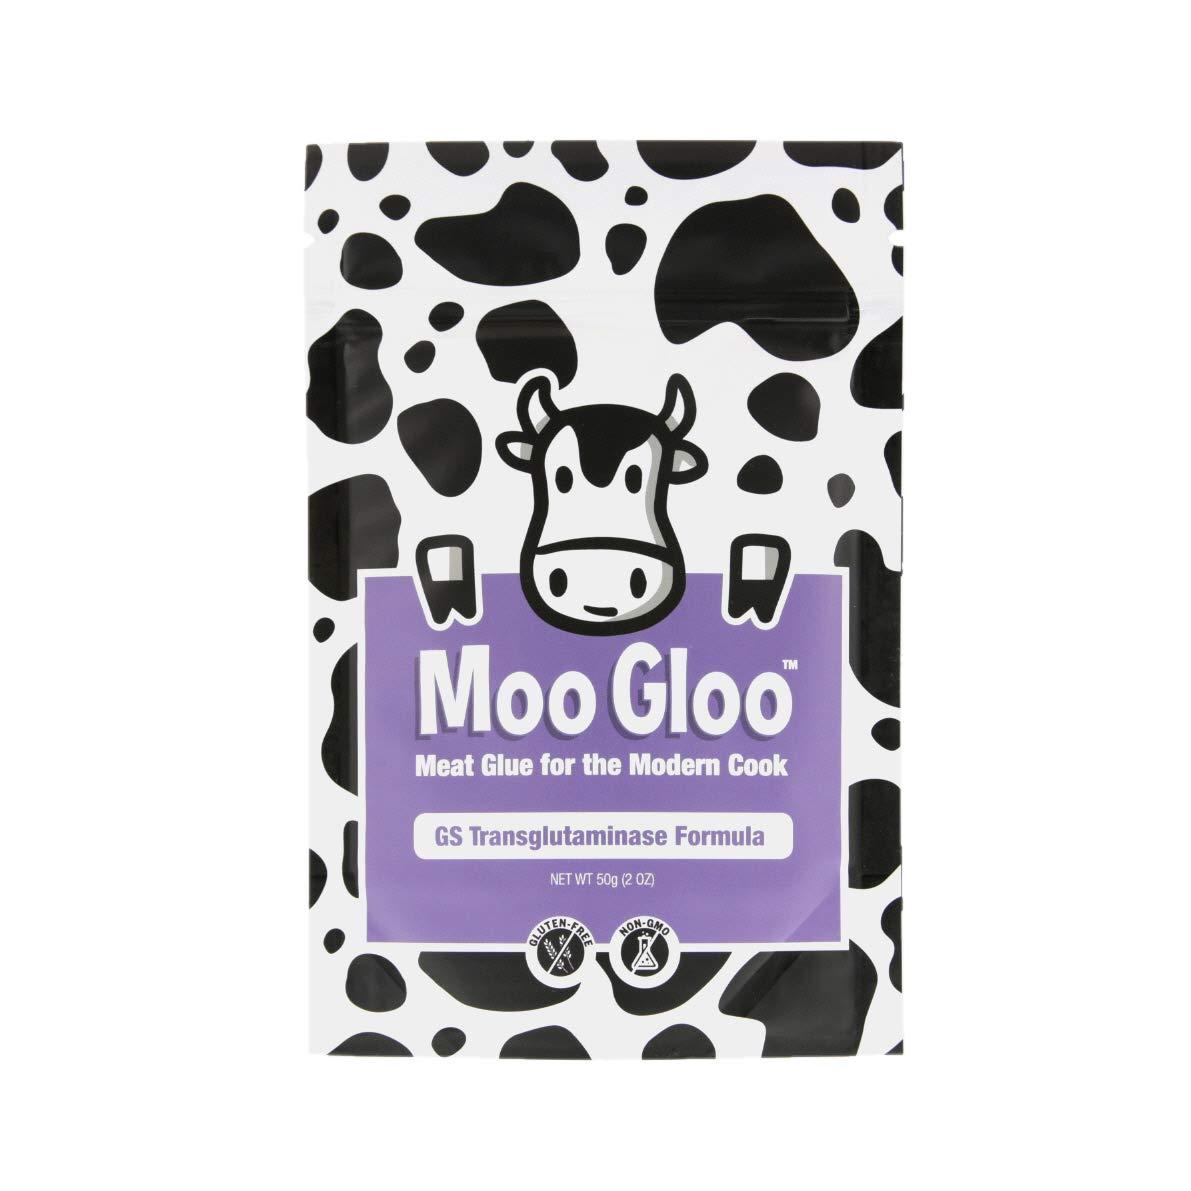 Moo Gloo Transglutaminase [TG, Meat Glue] - GS Formula 50g/2oz